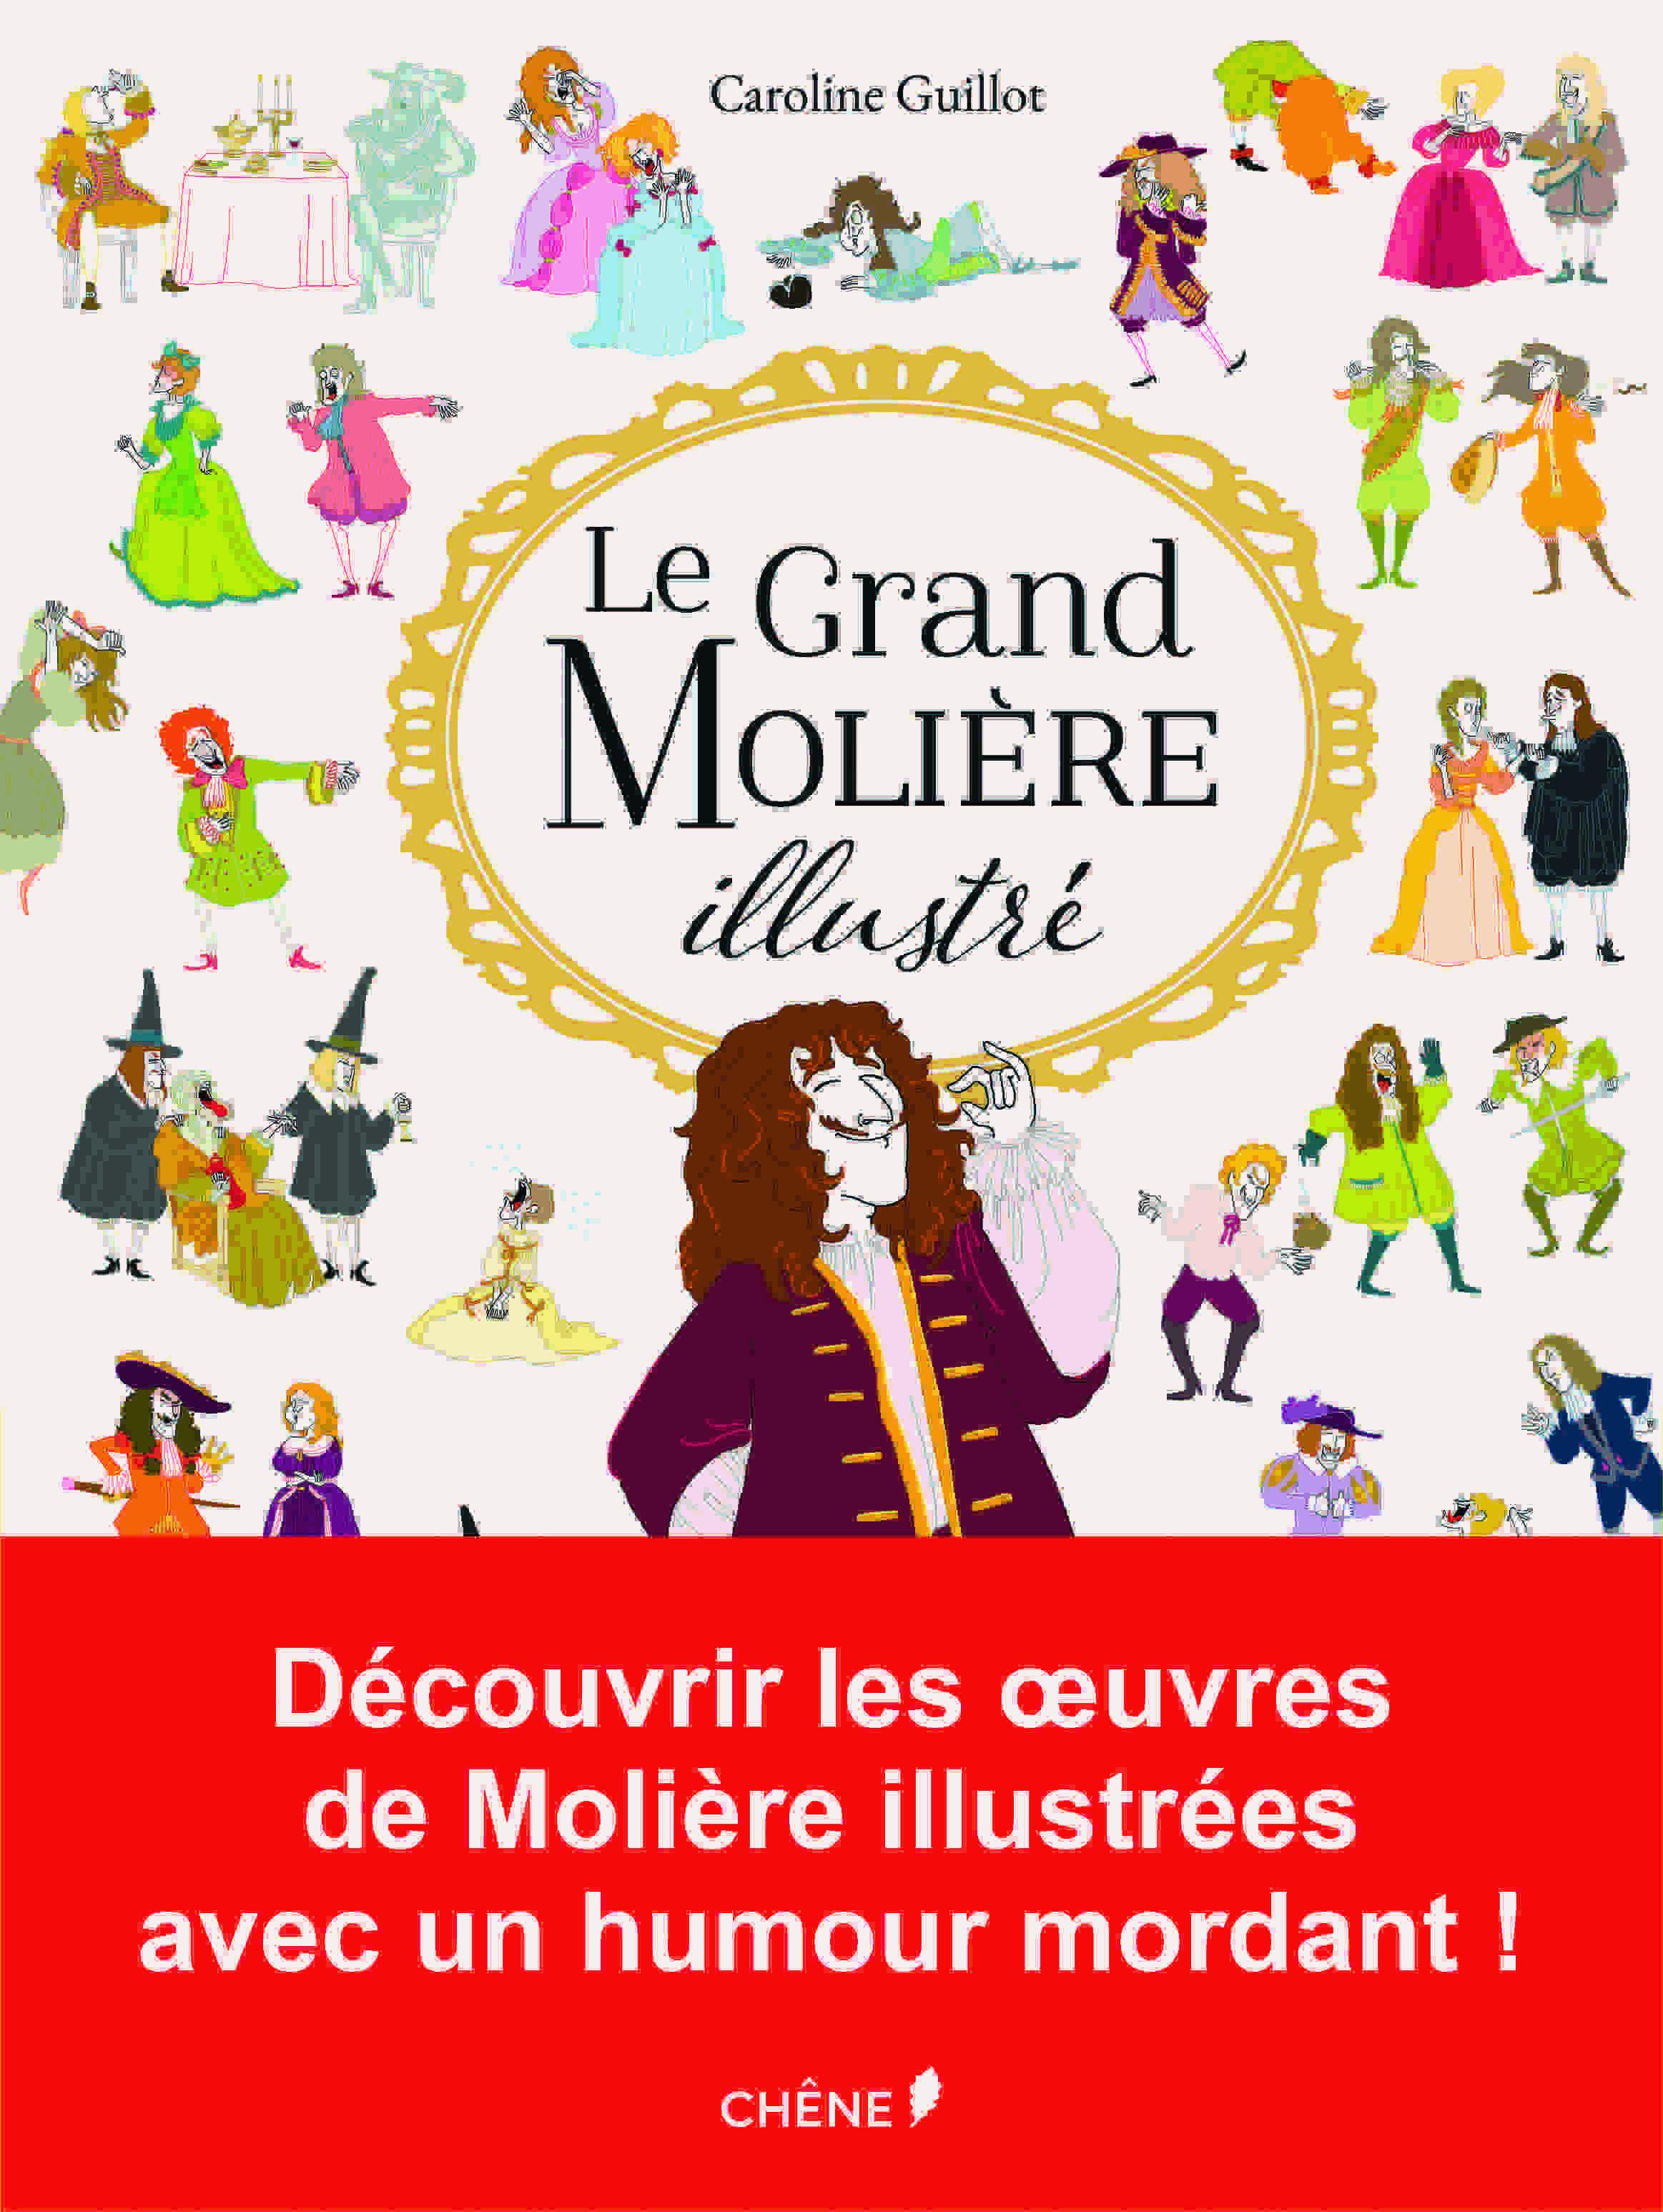 Le Grand Molière illustré, Éditions du Chêne, Caroline Guillot, Chêne, Rodolphe Fouano